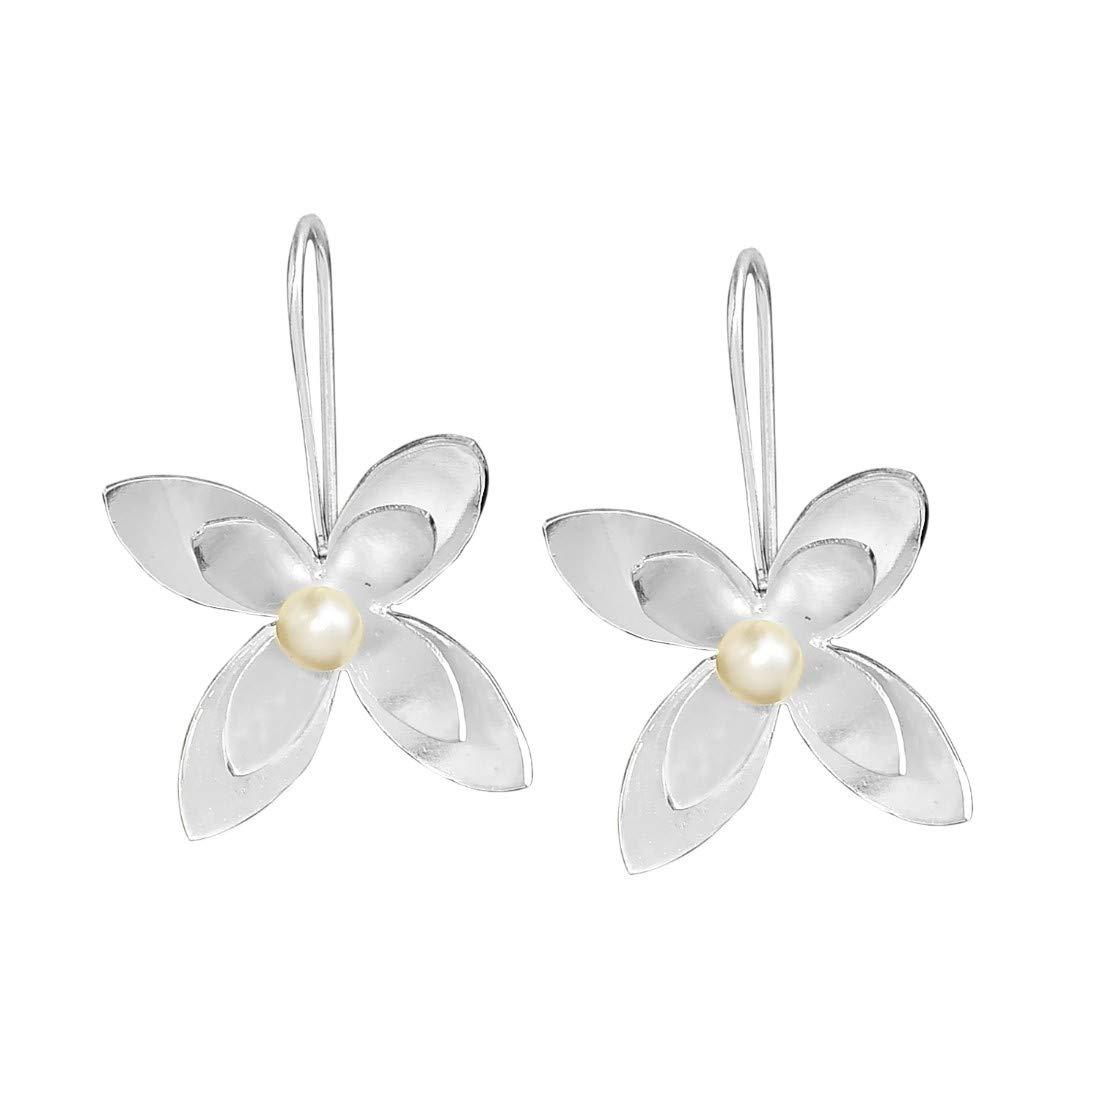 Silver Plated Classic Handmade Dangle Earrings for women and girls bohemian earrings